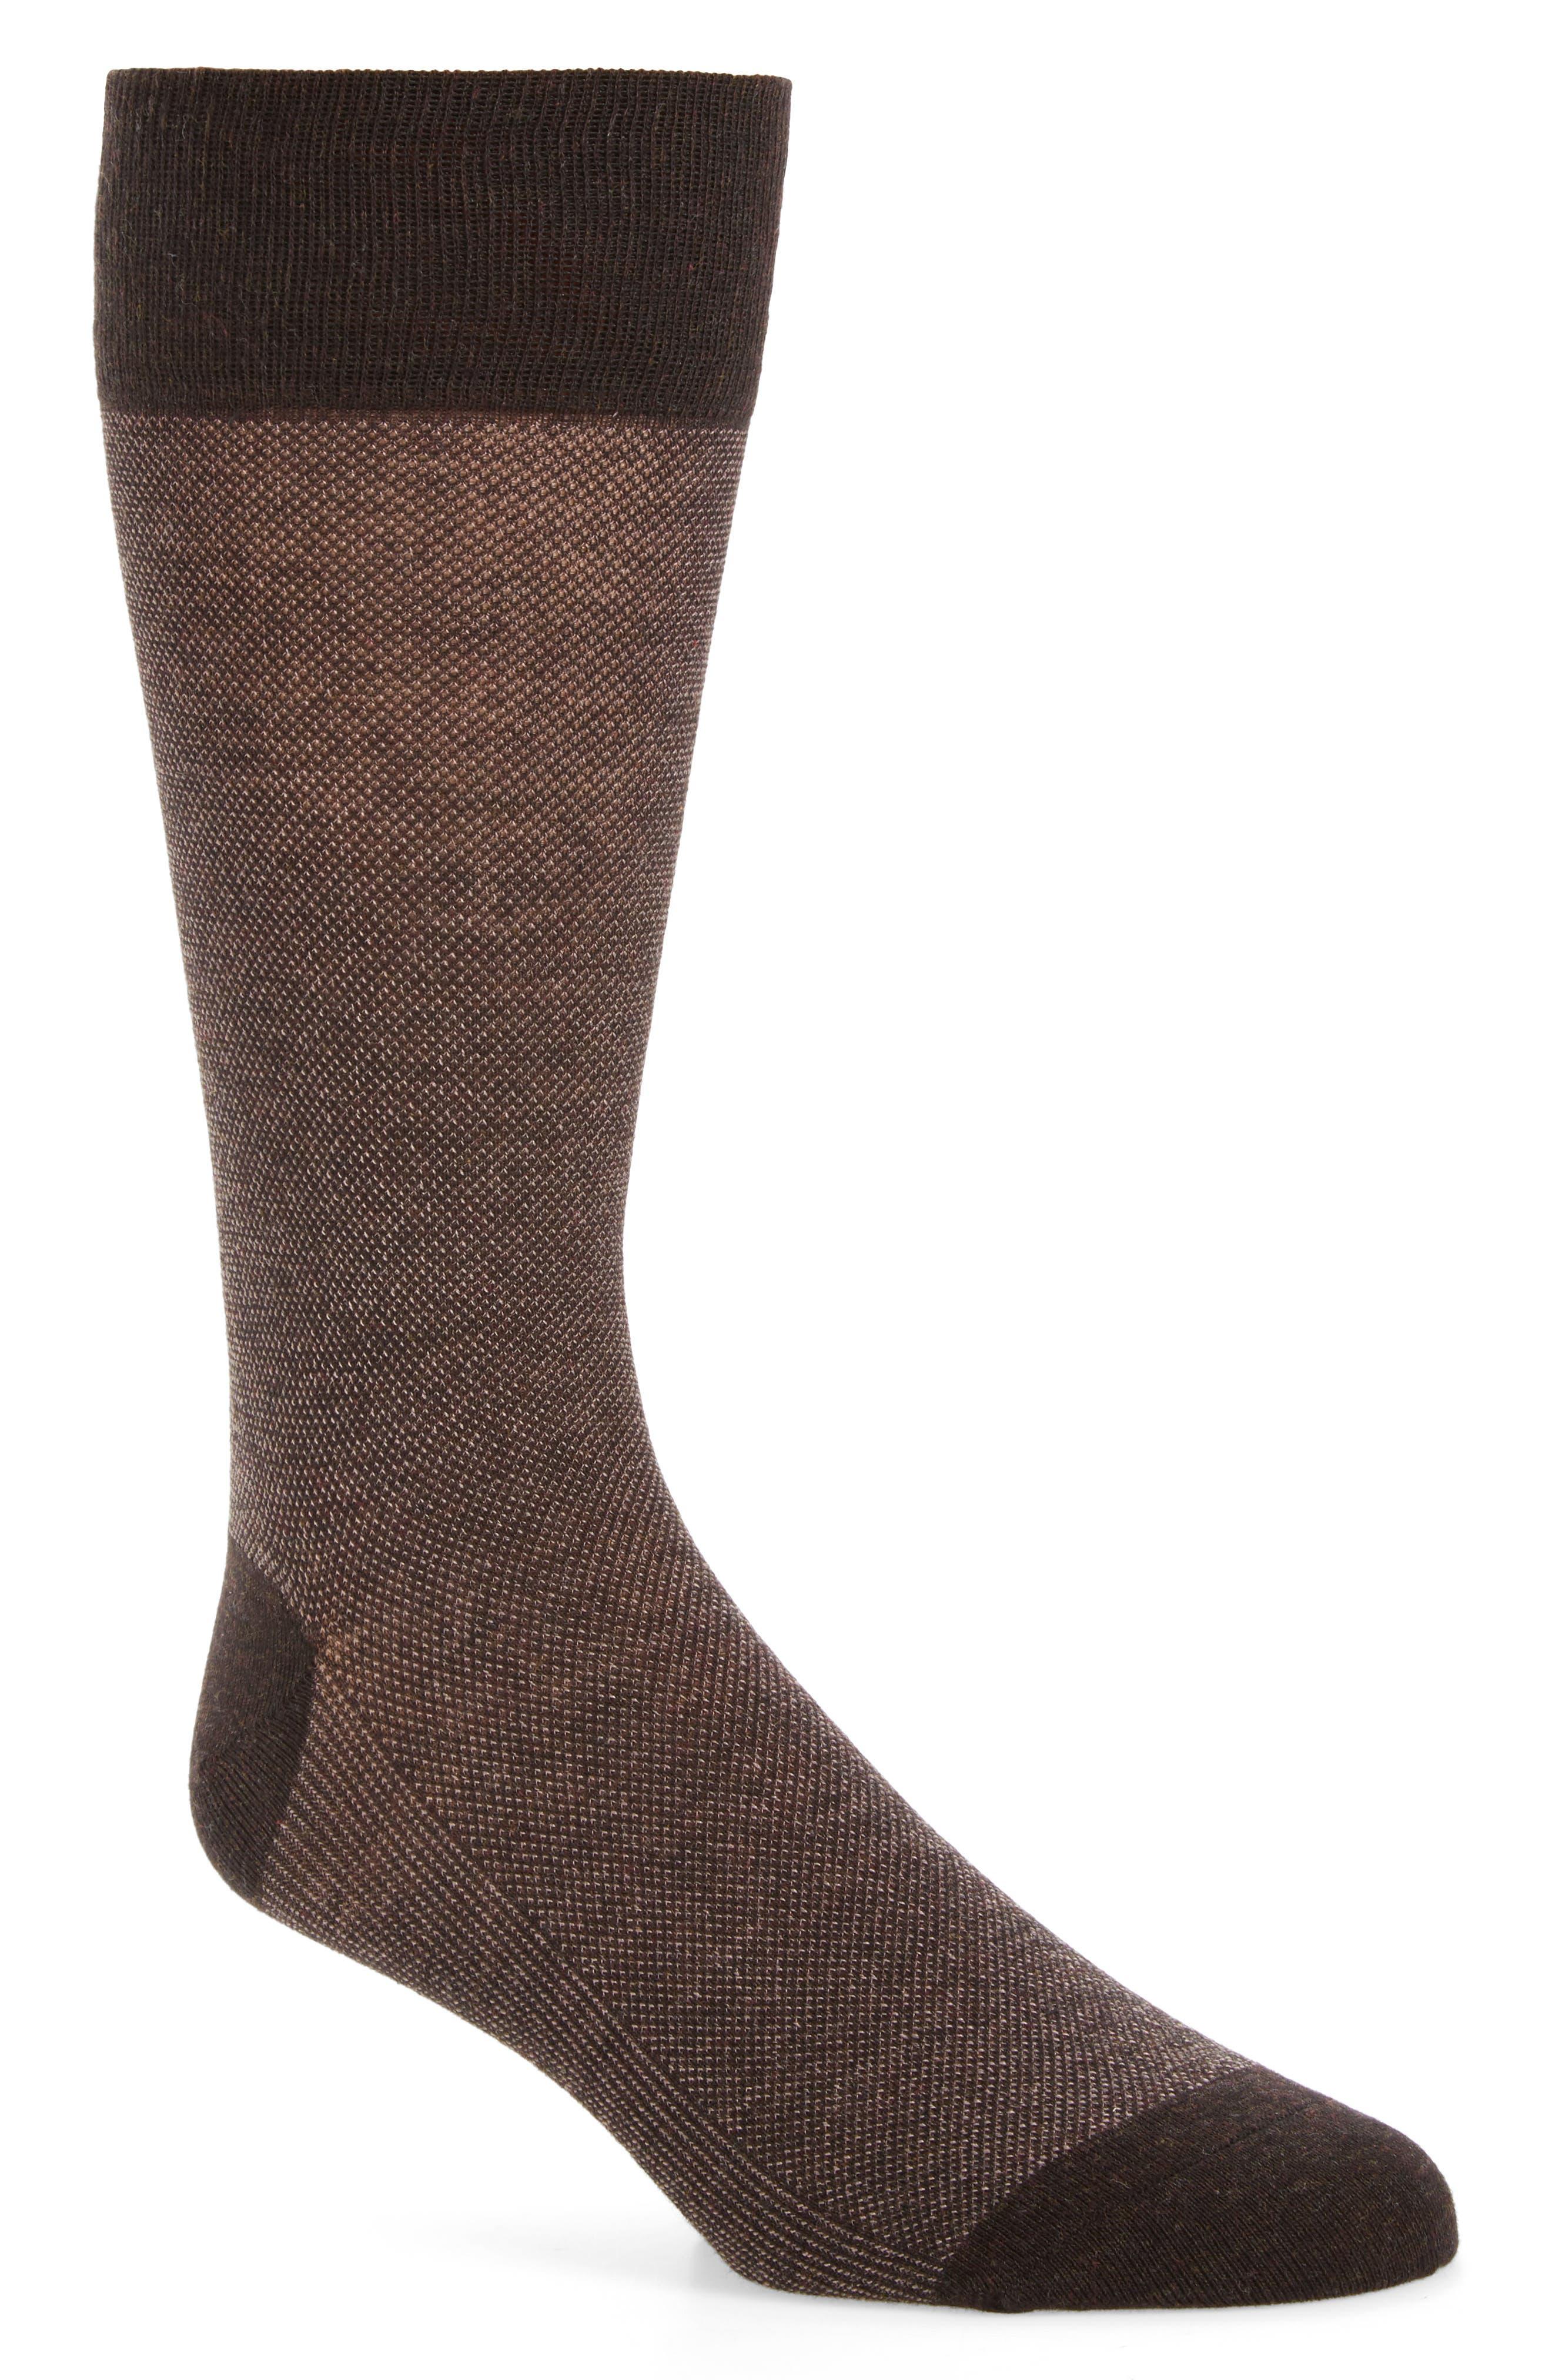 Pique Texture Crew Socks